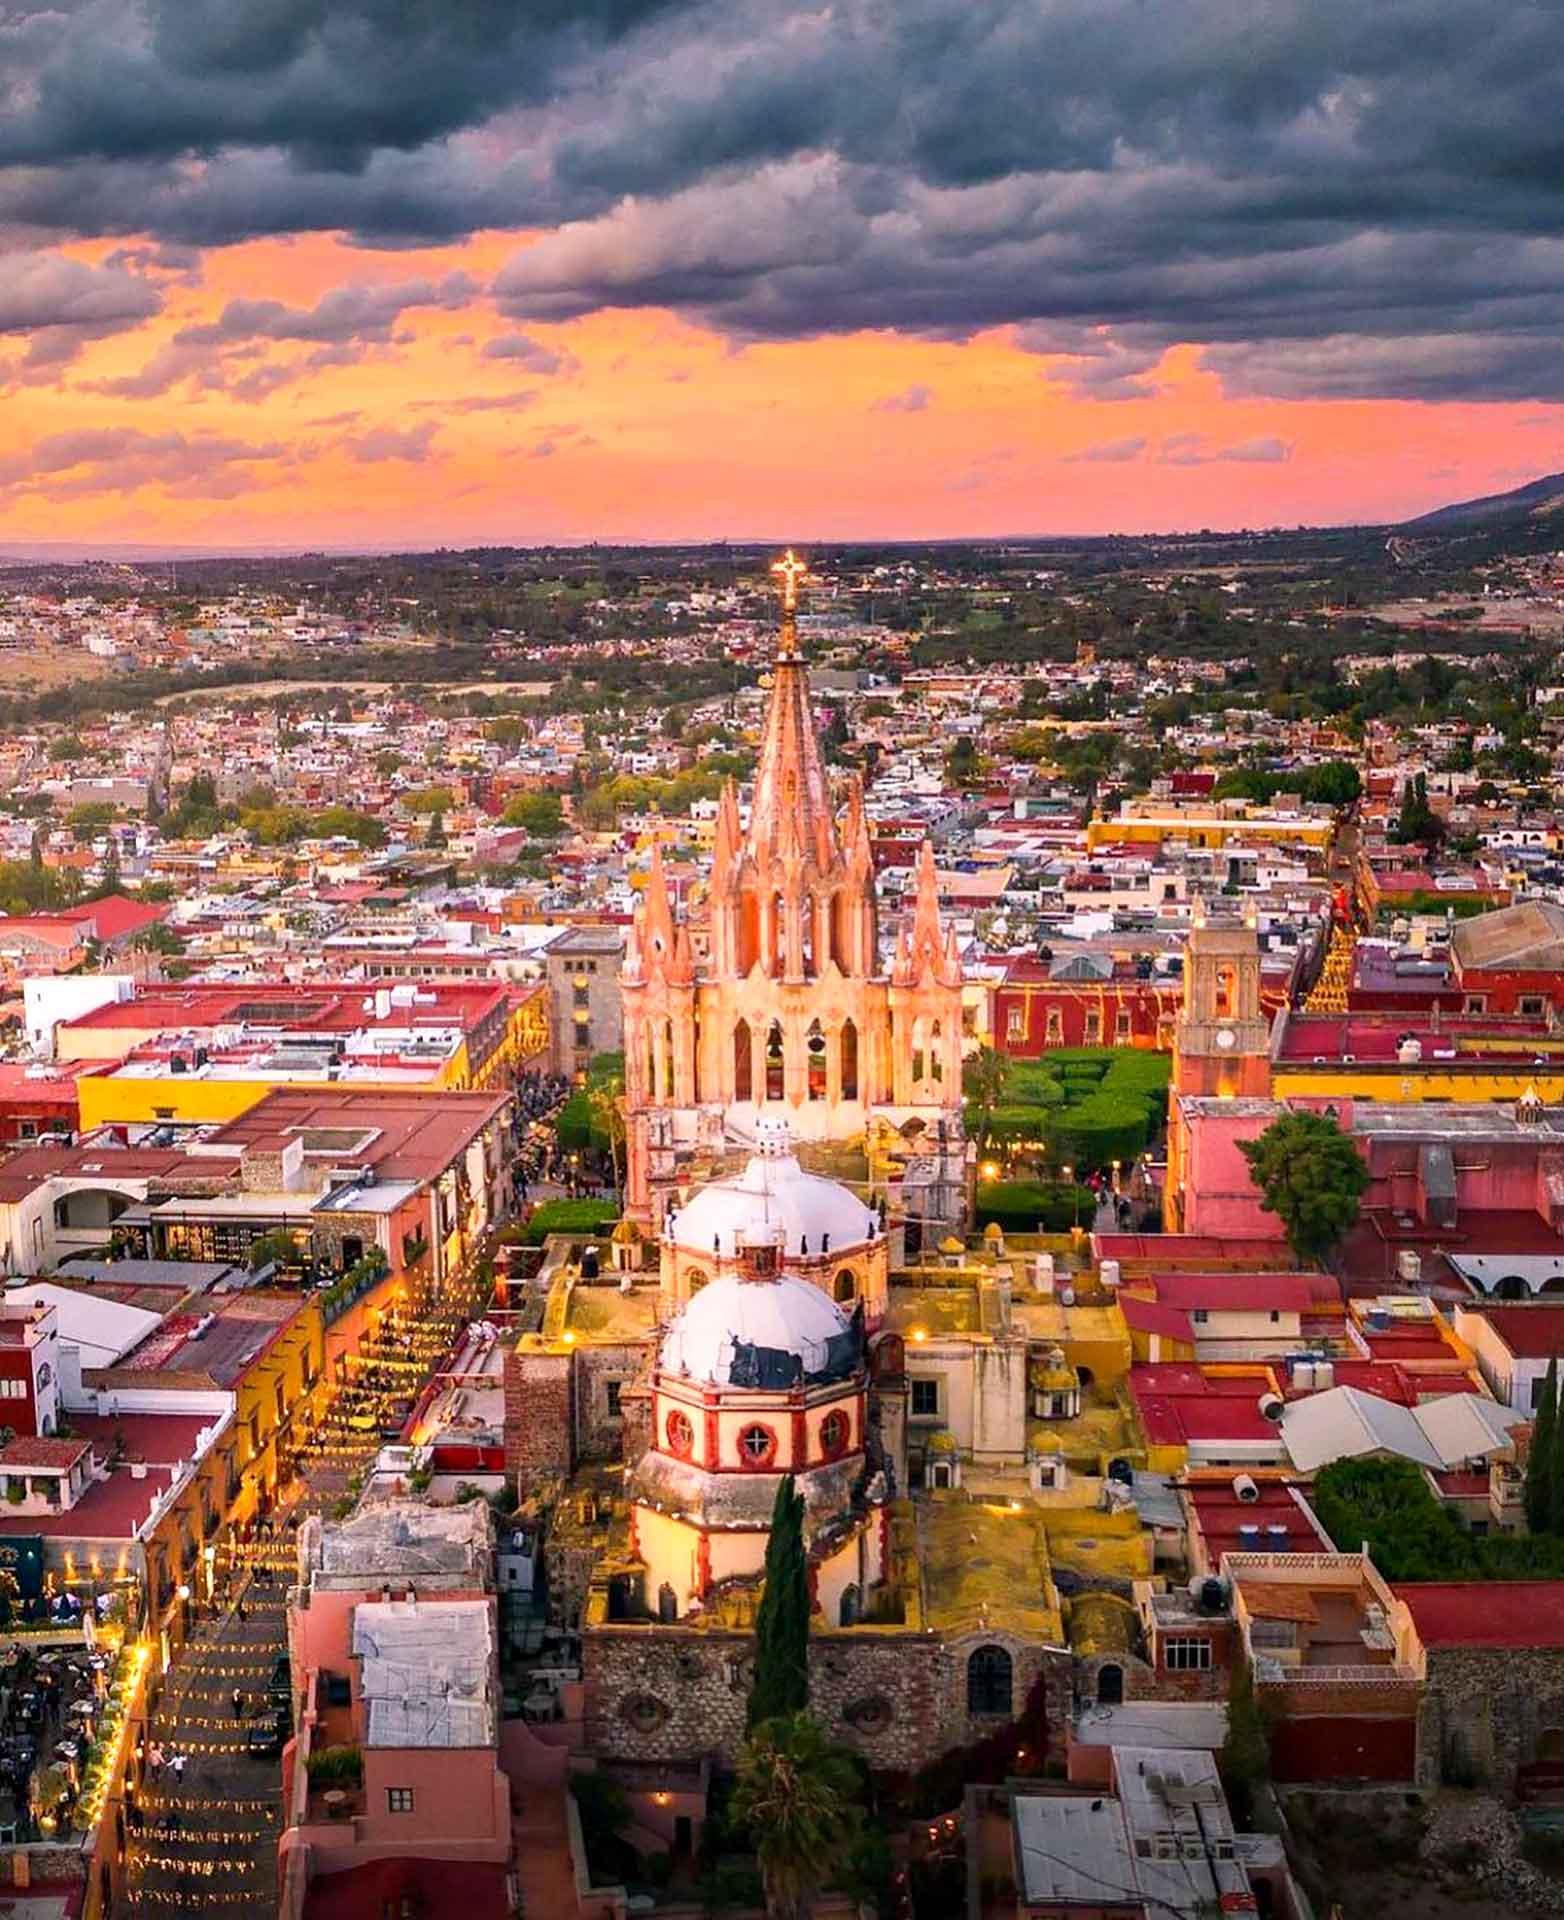 Viajeros inspirando viajeros San Miguel